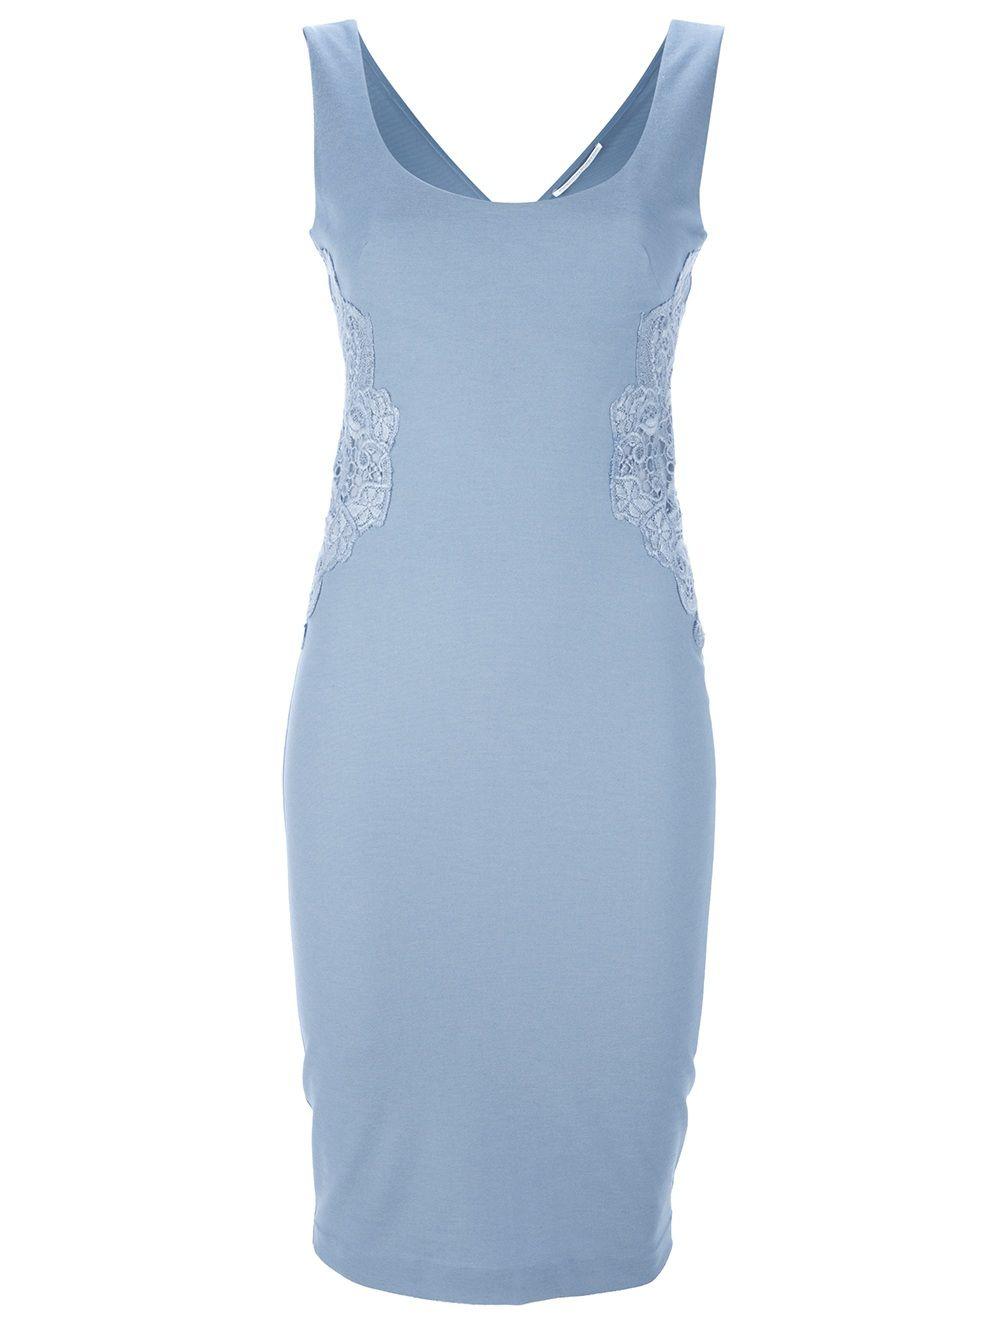 Ermanno Scervino Vestido Azul. - Splash - Farfetch.com.br